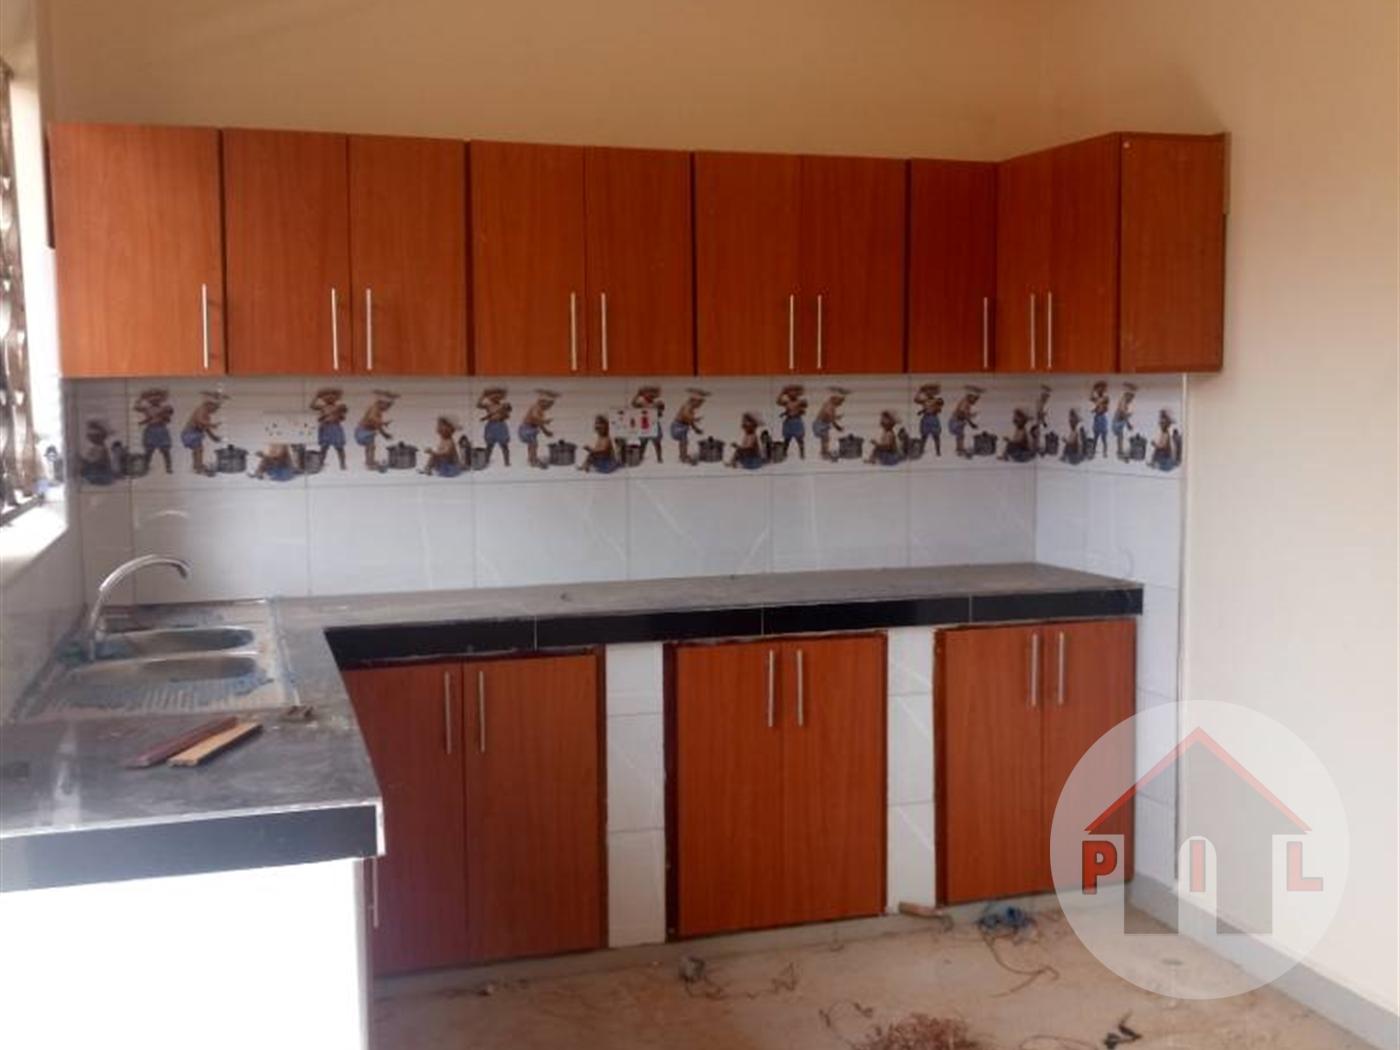 Kitchen (pantry)